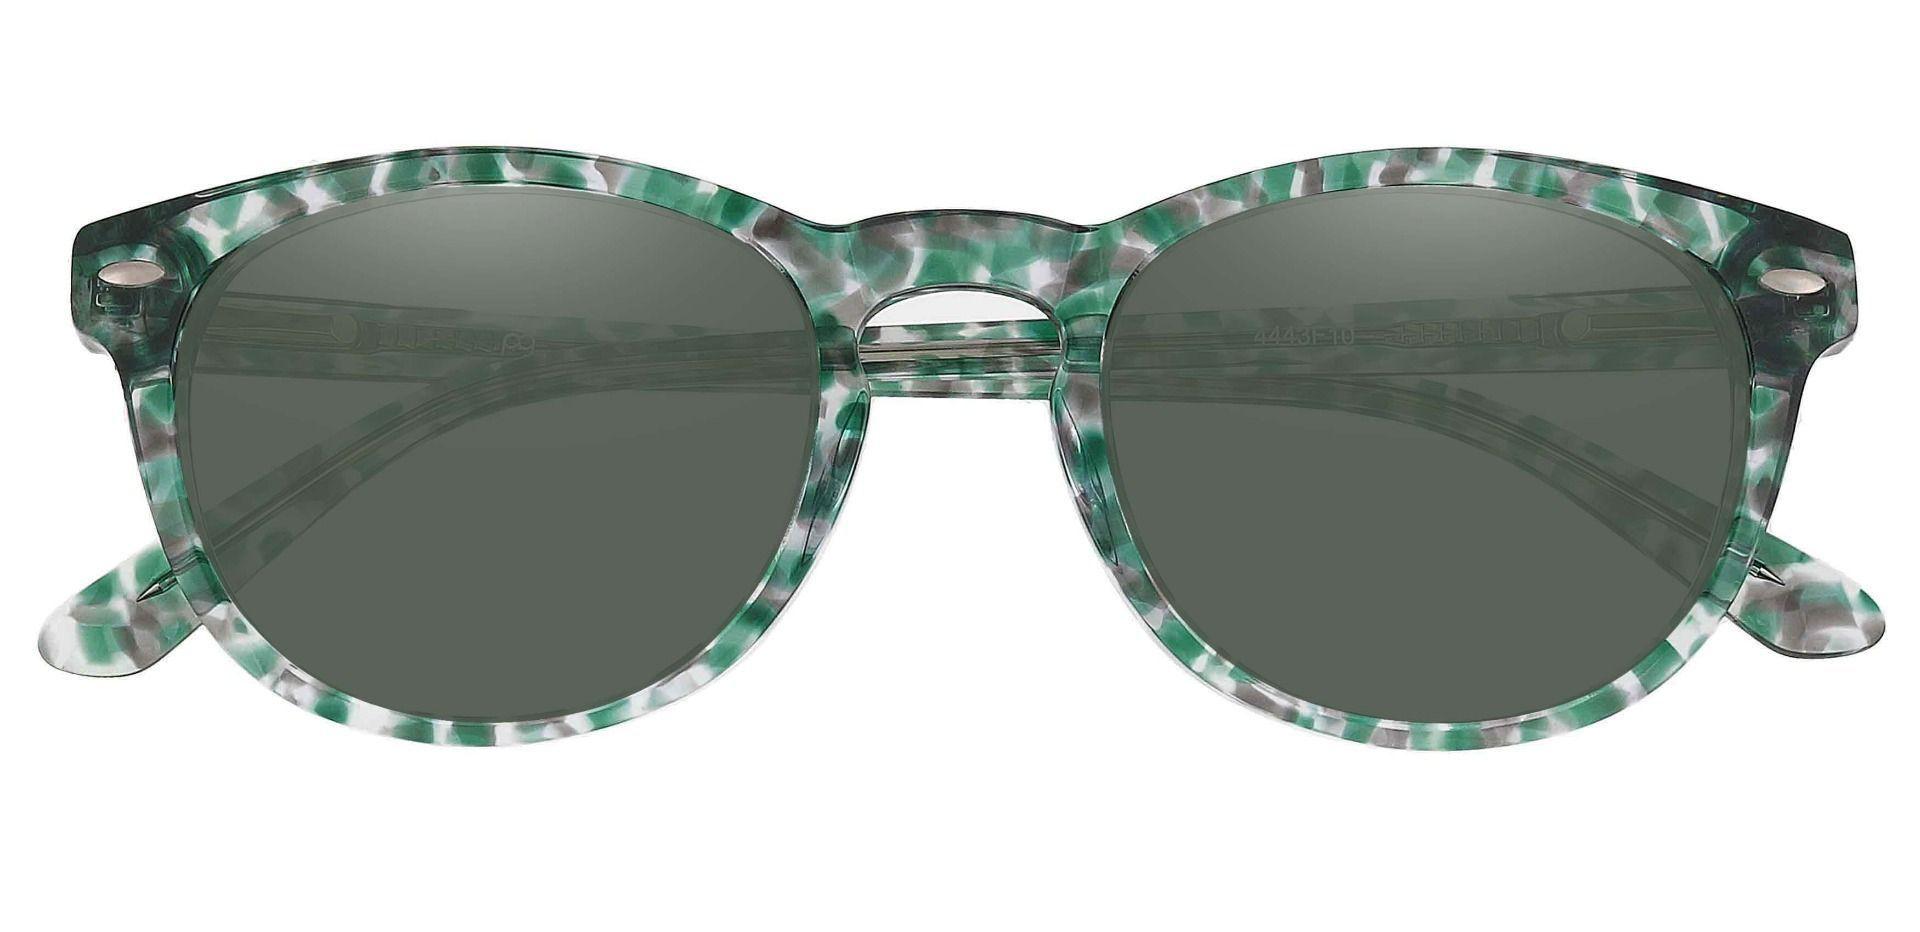 Laguna Oval Reading Sunglasses - Green Frame With Green Lenses